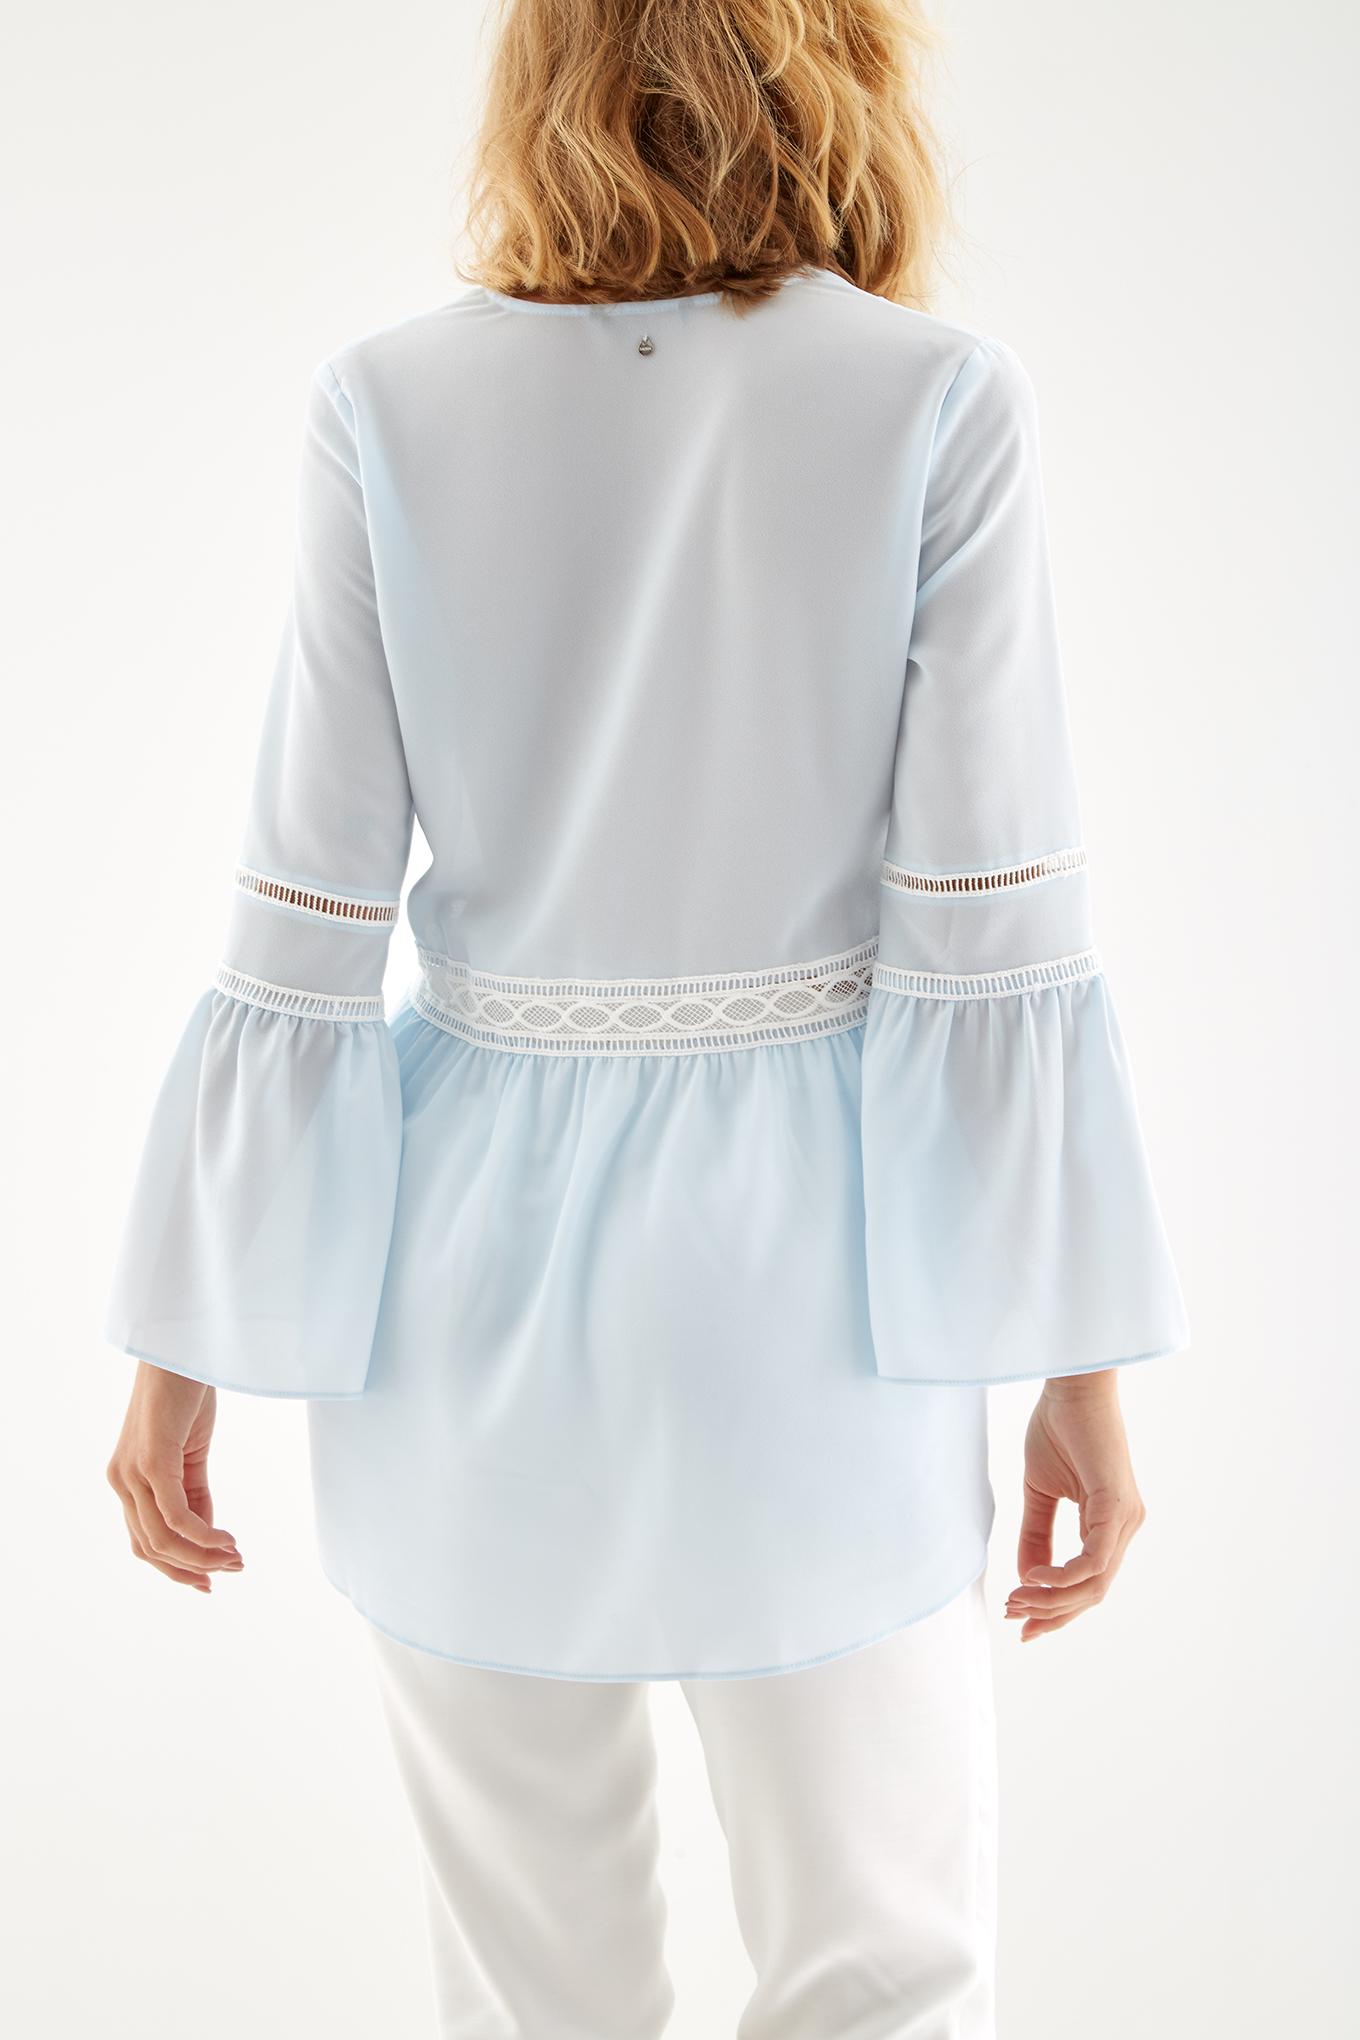 Blusa Azul Claro Fantasy Mulher